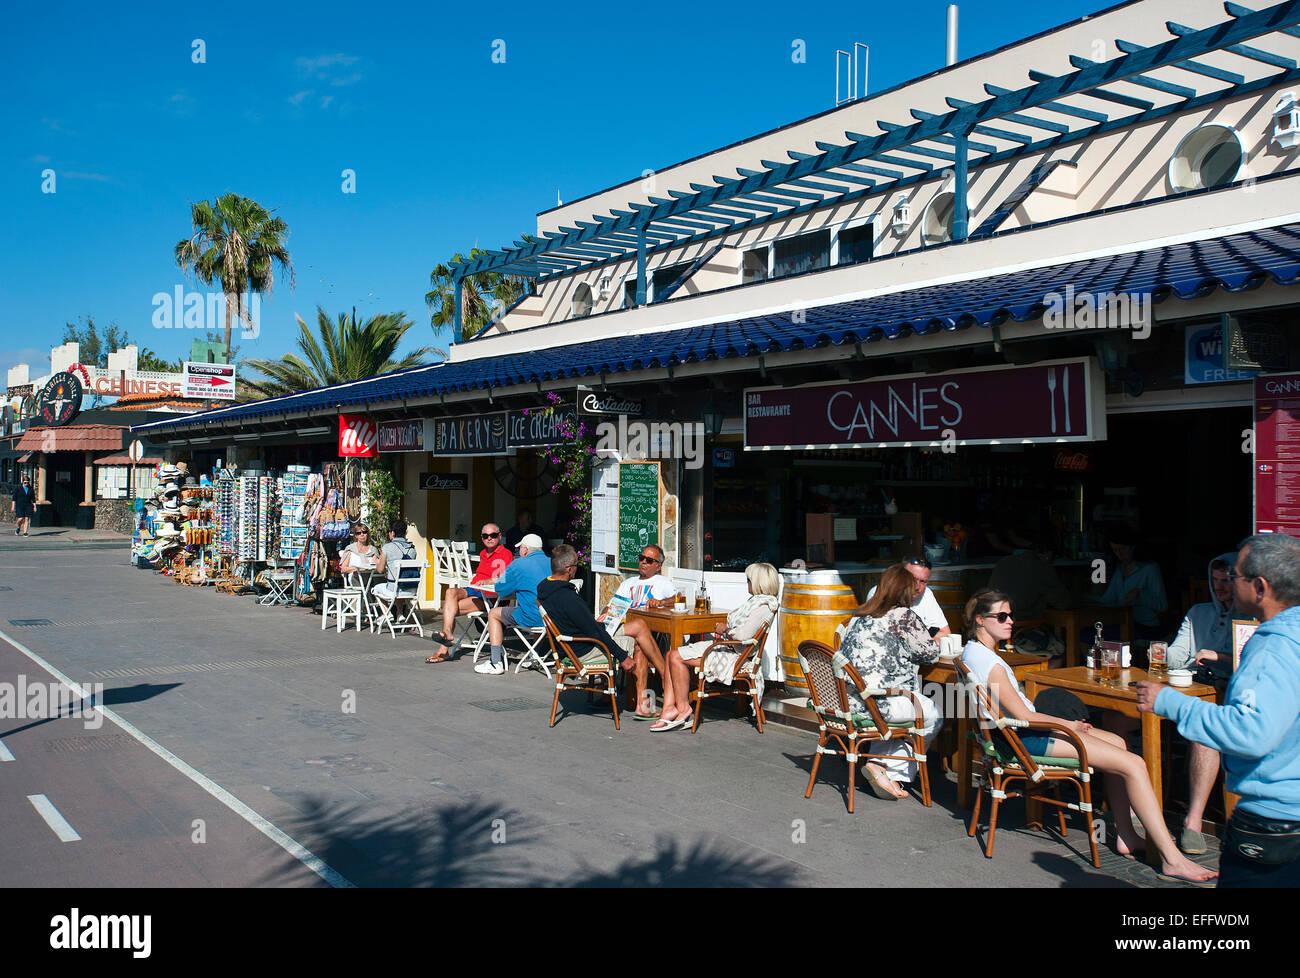 Cafe-Bar, Corralejo, Fuerteventura, Kanarische Inseln, Spanien Stockbild